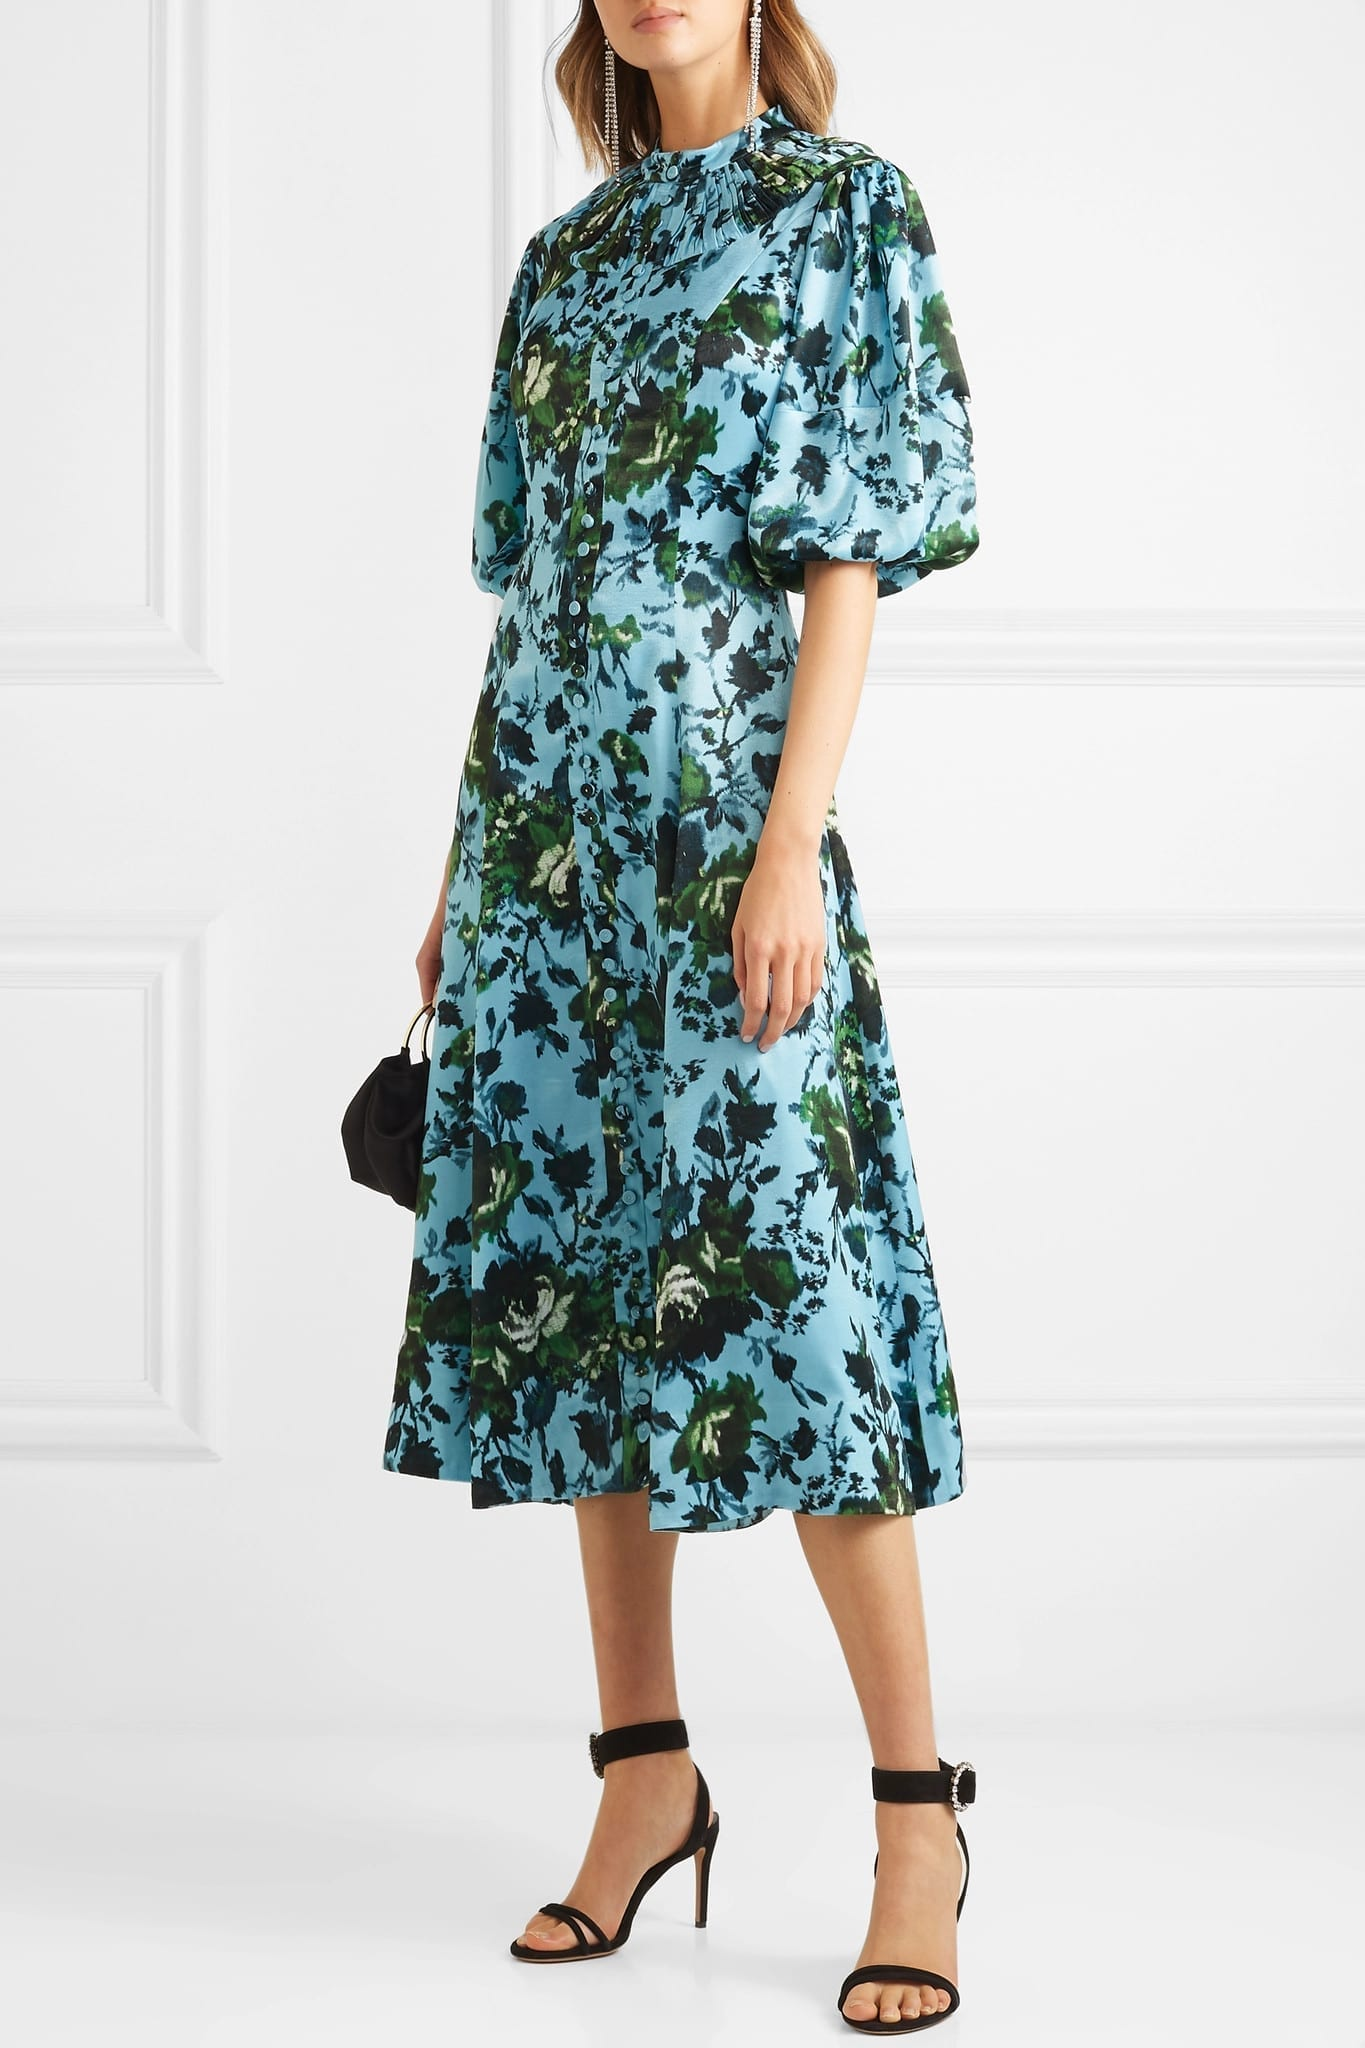 ERDEM Margo Floral-Print Satin Midi Blue Dress